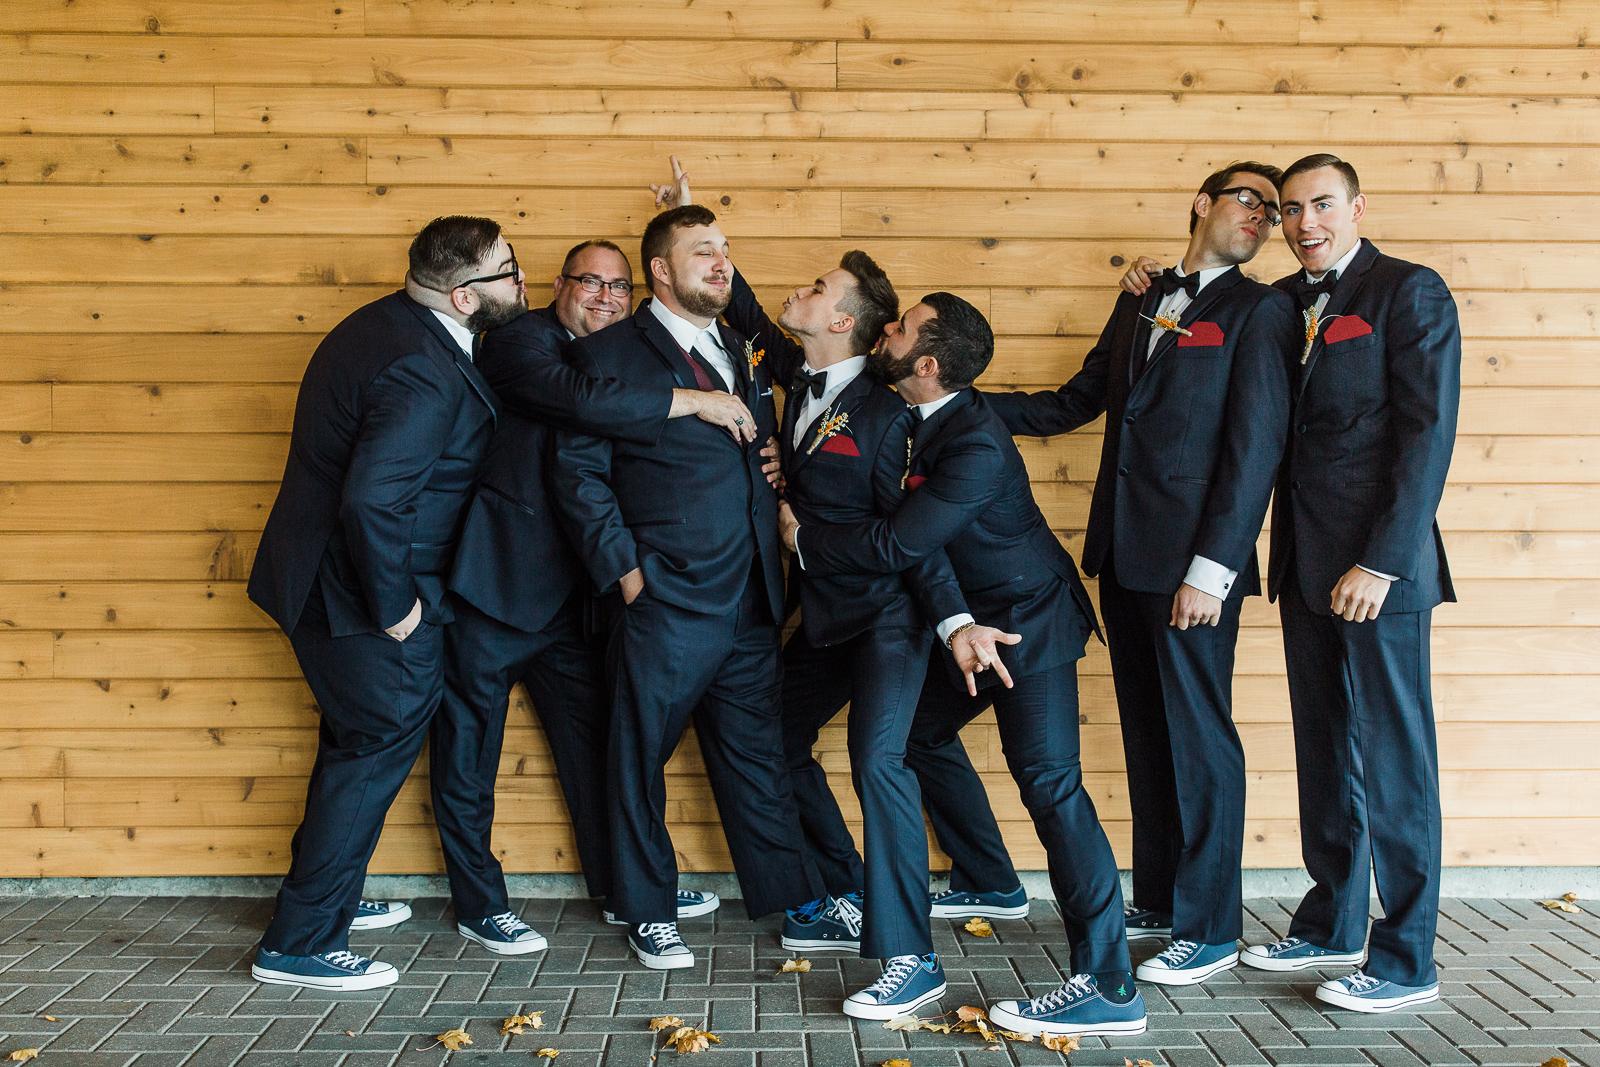 gander-wedding-photographer-14.jpg